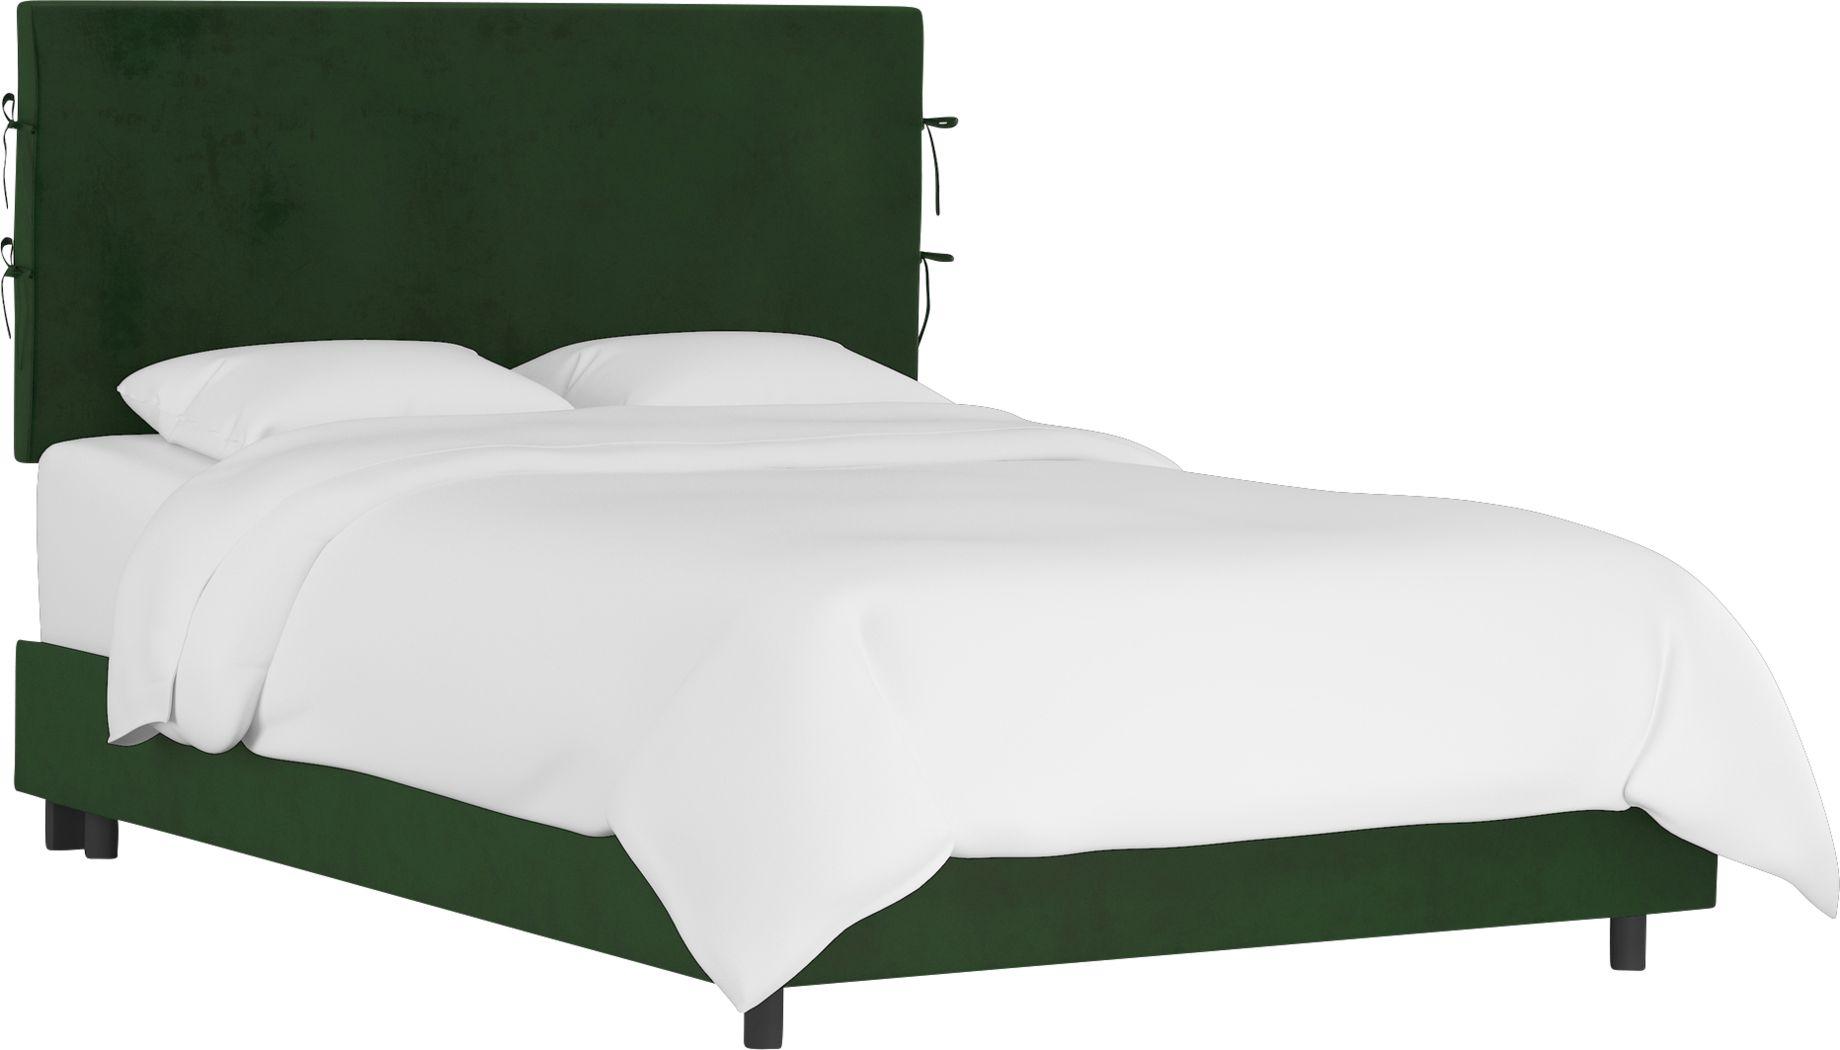 Deep Forest Emerald King Upholstered Bed